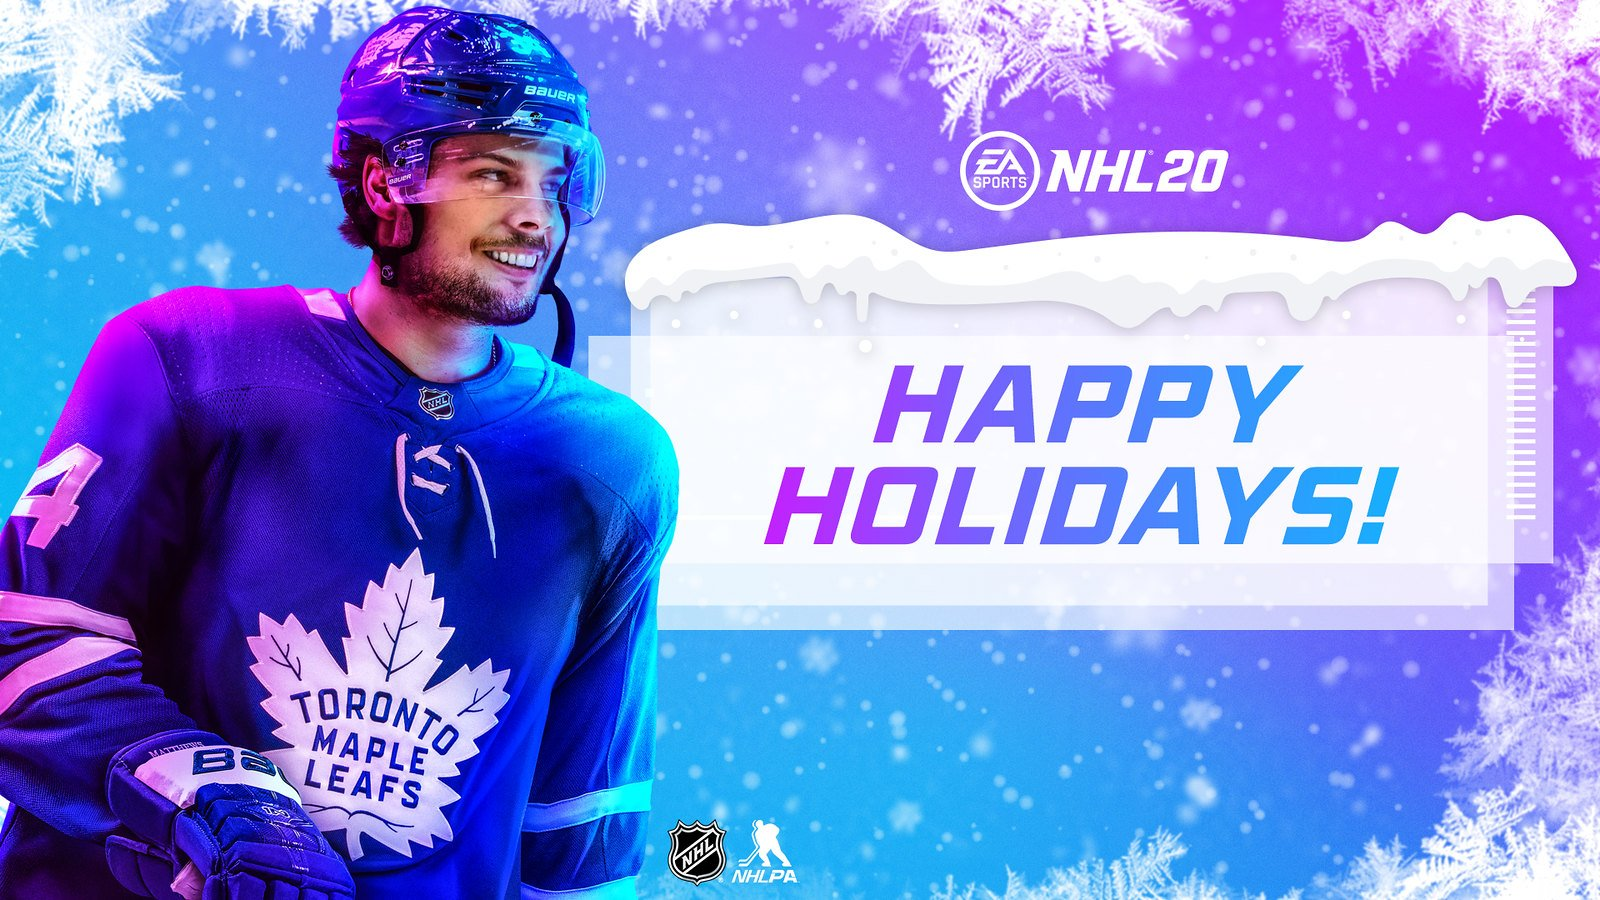 Nhl 20 Happy Holidays Wallpaper Theme